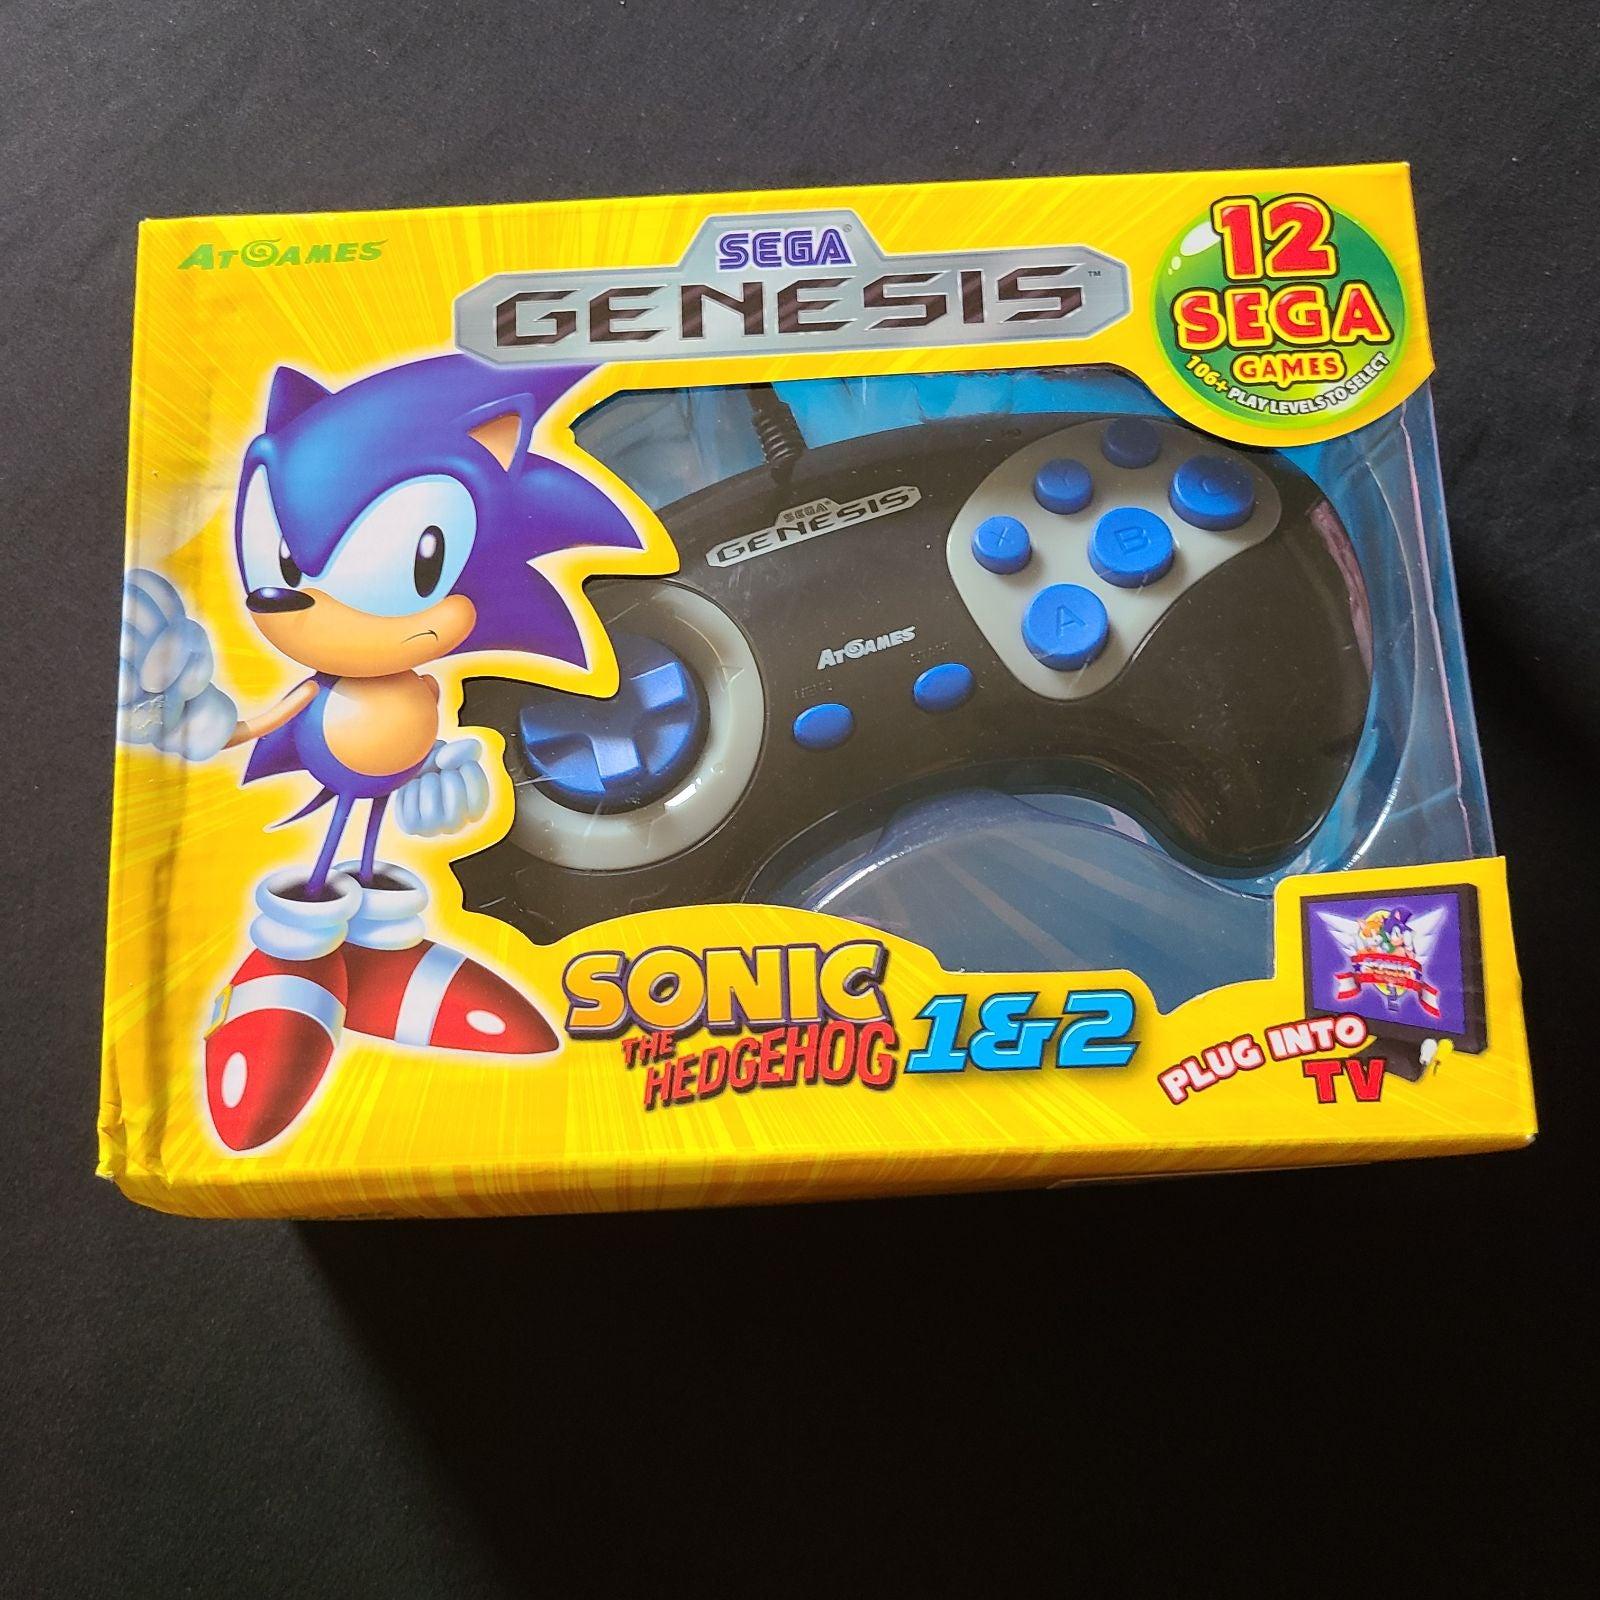 New! Sega Genesis: Sonic The hedgehog